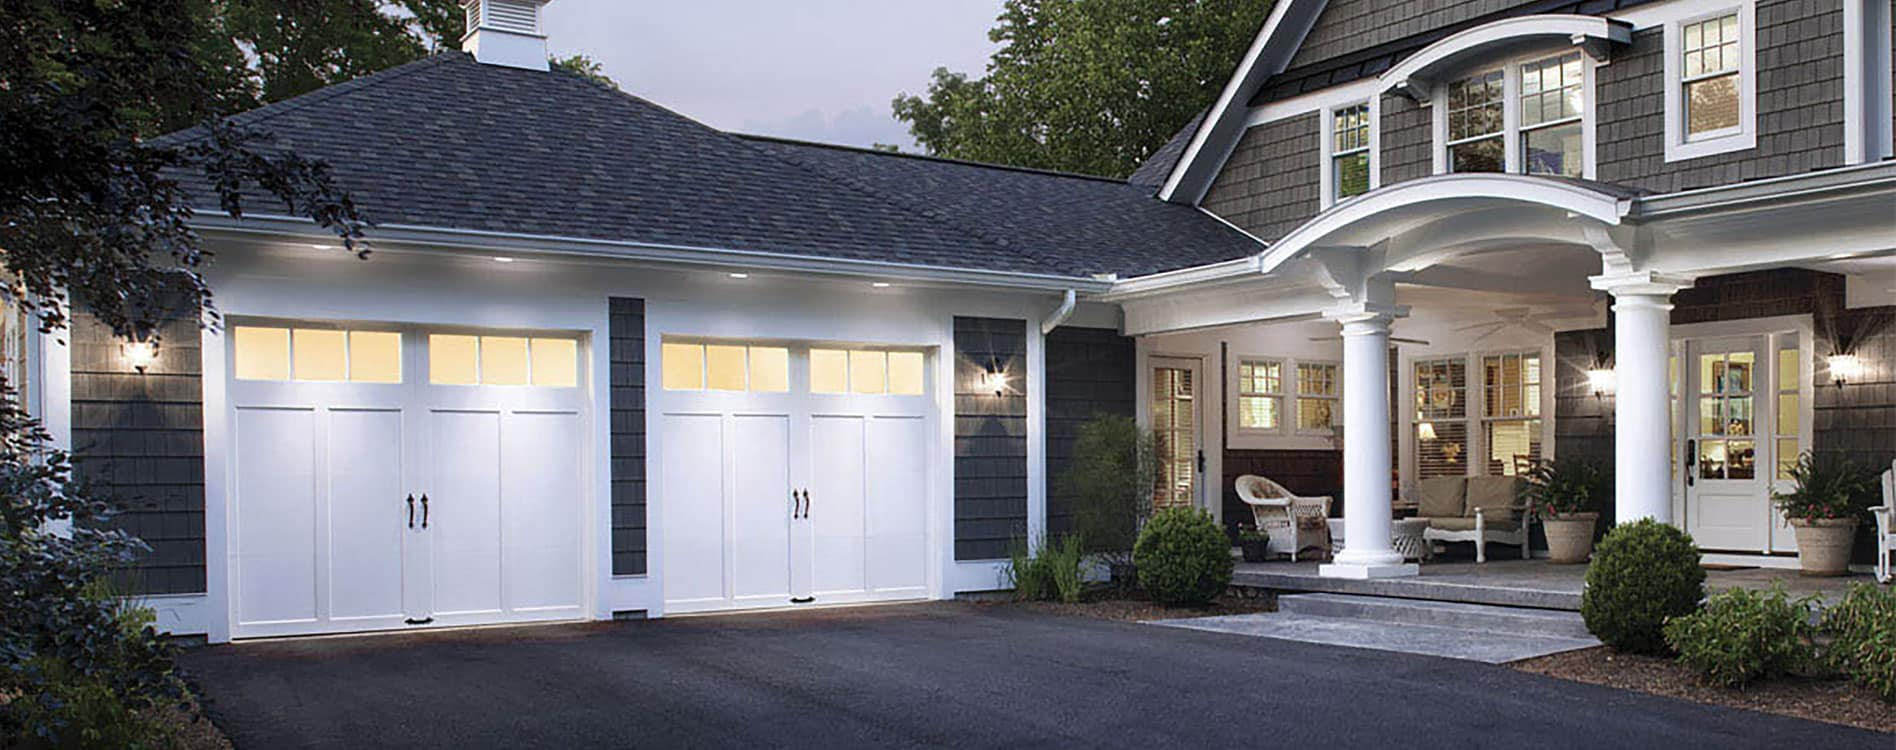 Garage Door Spring Repair Okc We Offer Same Day Service